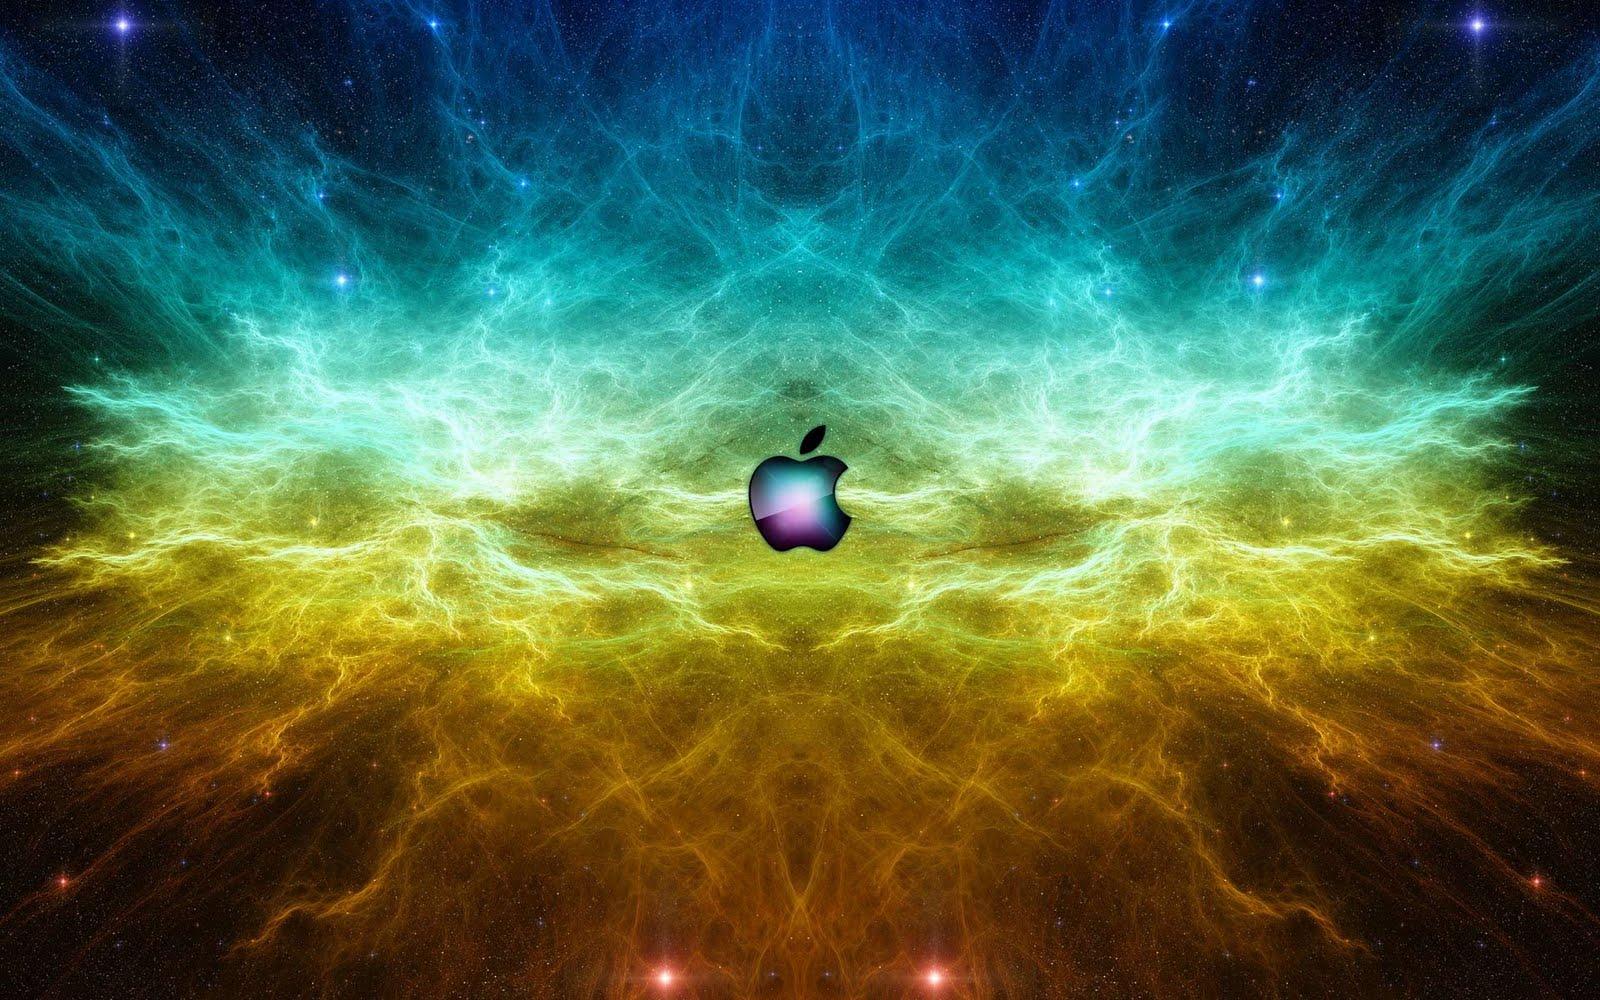 http://2.bp.blogspot.com/-PvLNQQSCkJs/TtxqNYoKIuI/AAAAAAAAAqw/rUFxbPGkc6U/s1600/nebulae-hd-8-756961.jpg